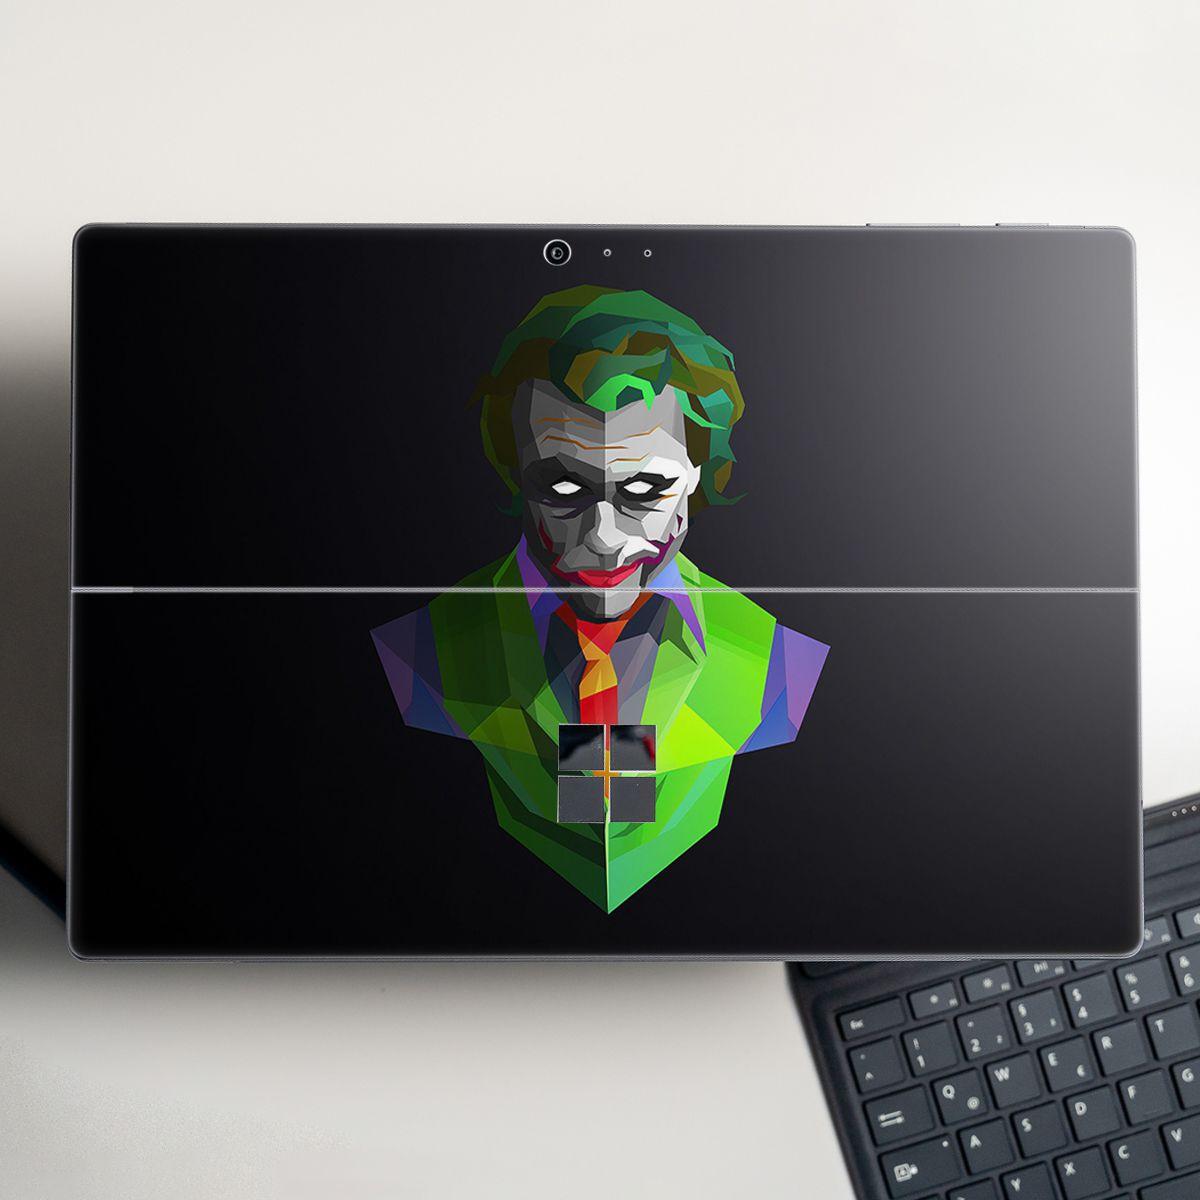 Skin dán hình Joker x03 cho Surface Go, Pro 2, Pro 3, Pro 4, Pro 5, Pro 6, Pro 7, Pro X